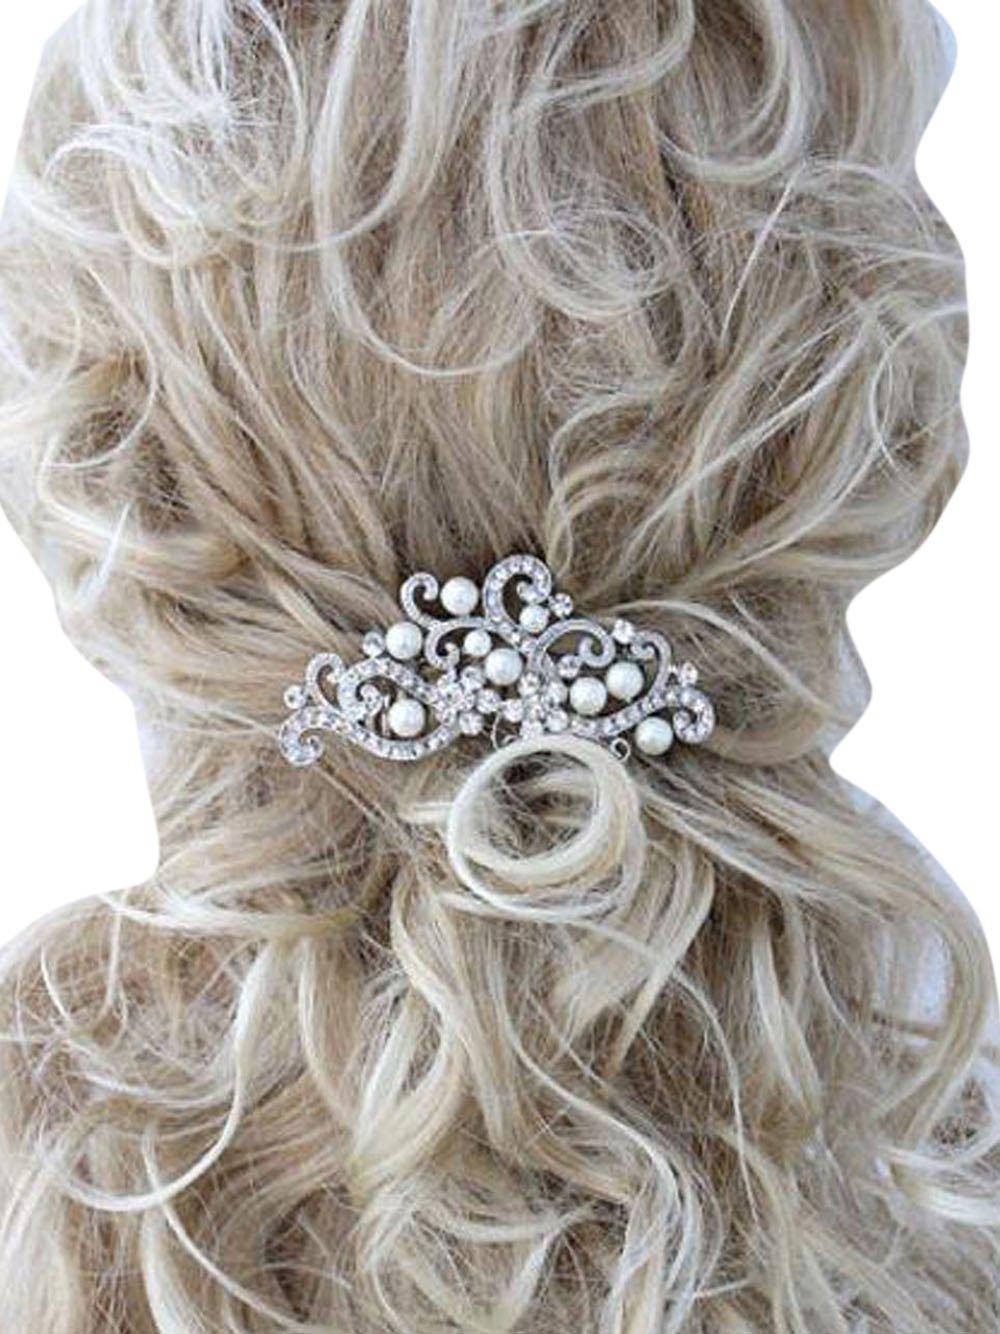 df60a8dcd4b Missgrace Crystal Jewelry Comb Bridal Headpiece Hair Clip Headband (Silver)